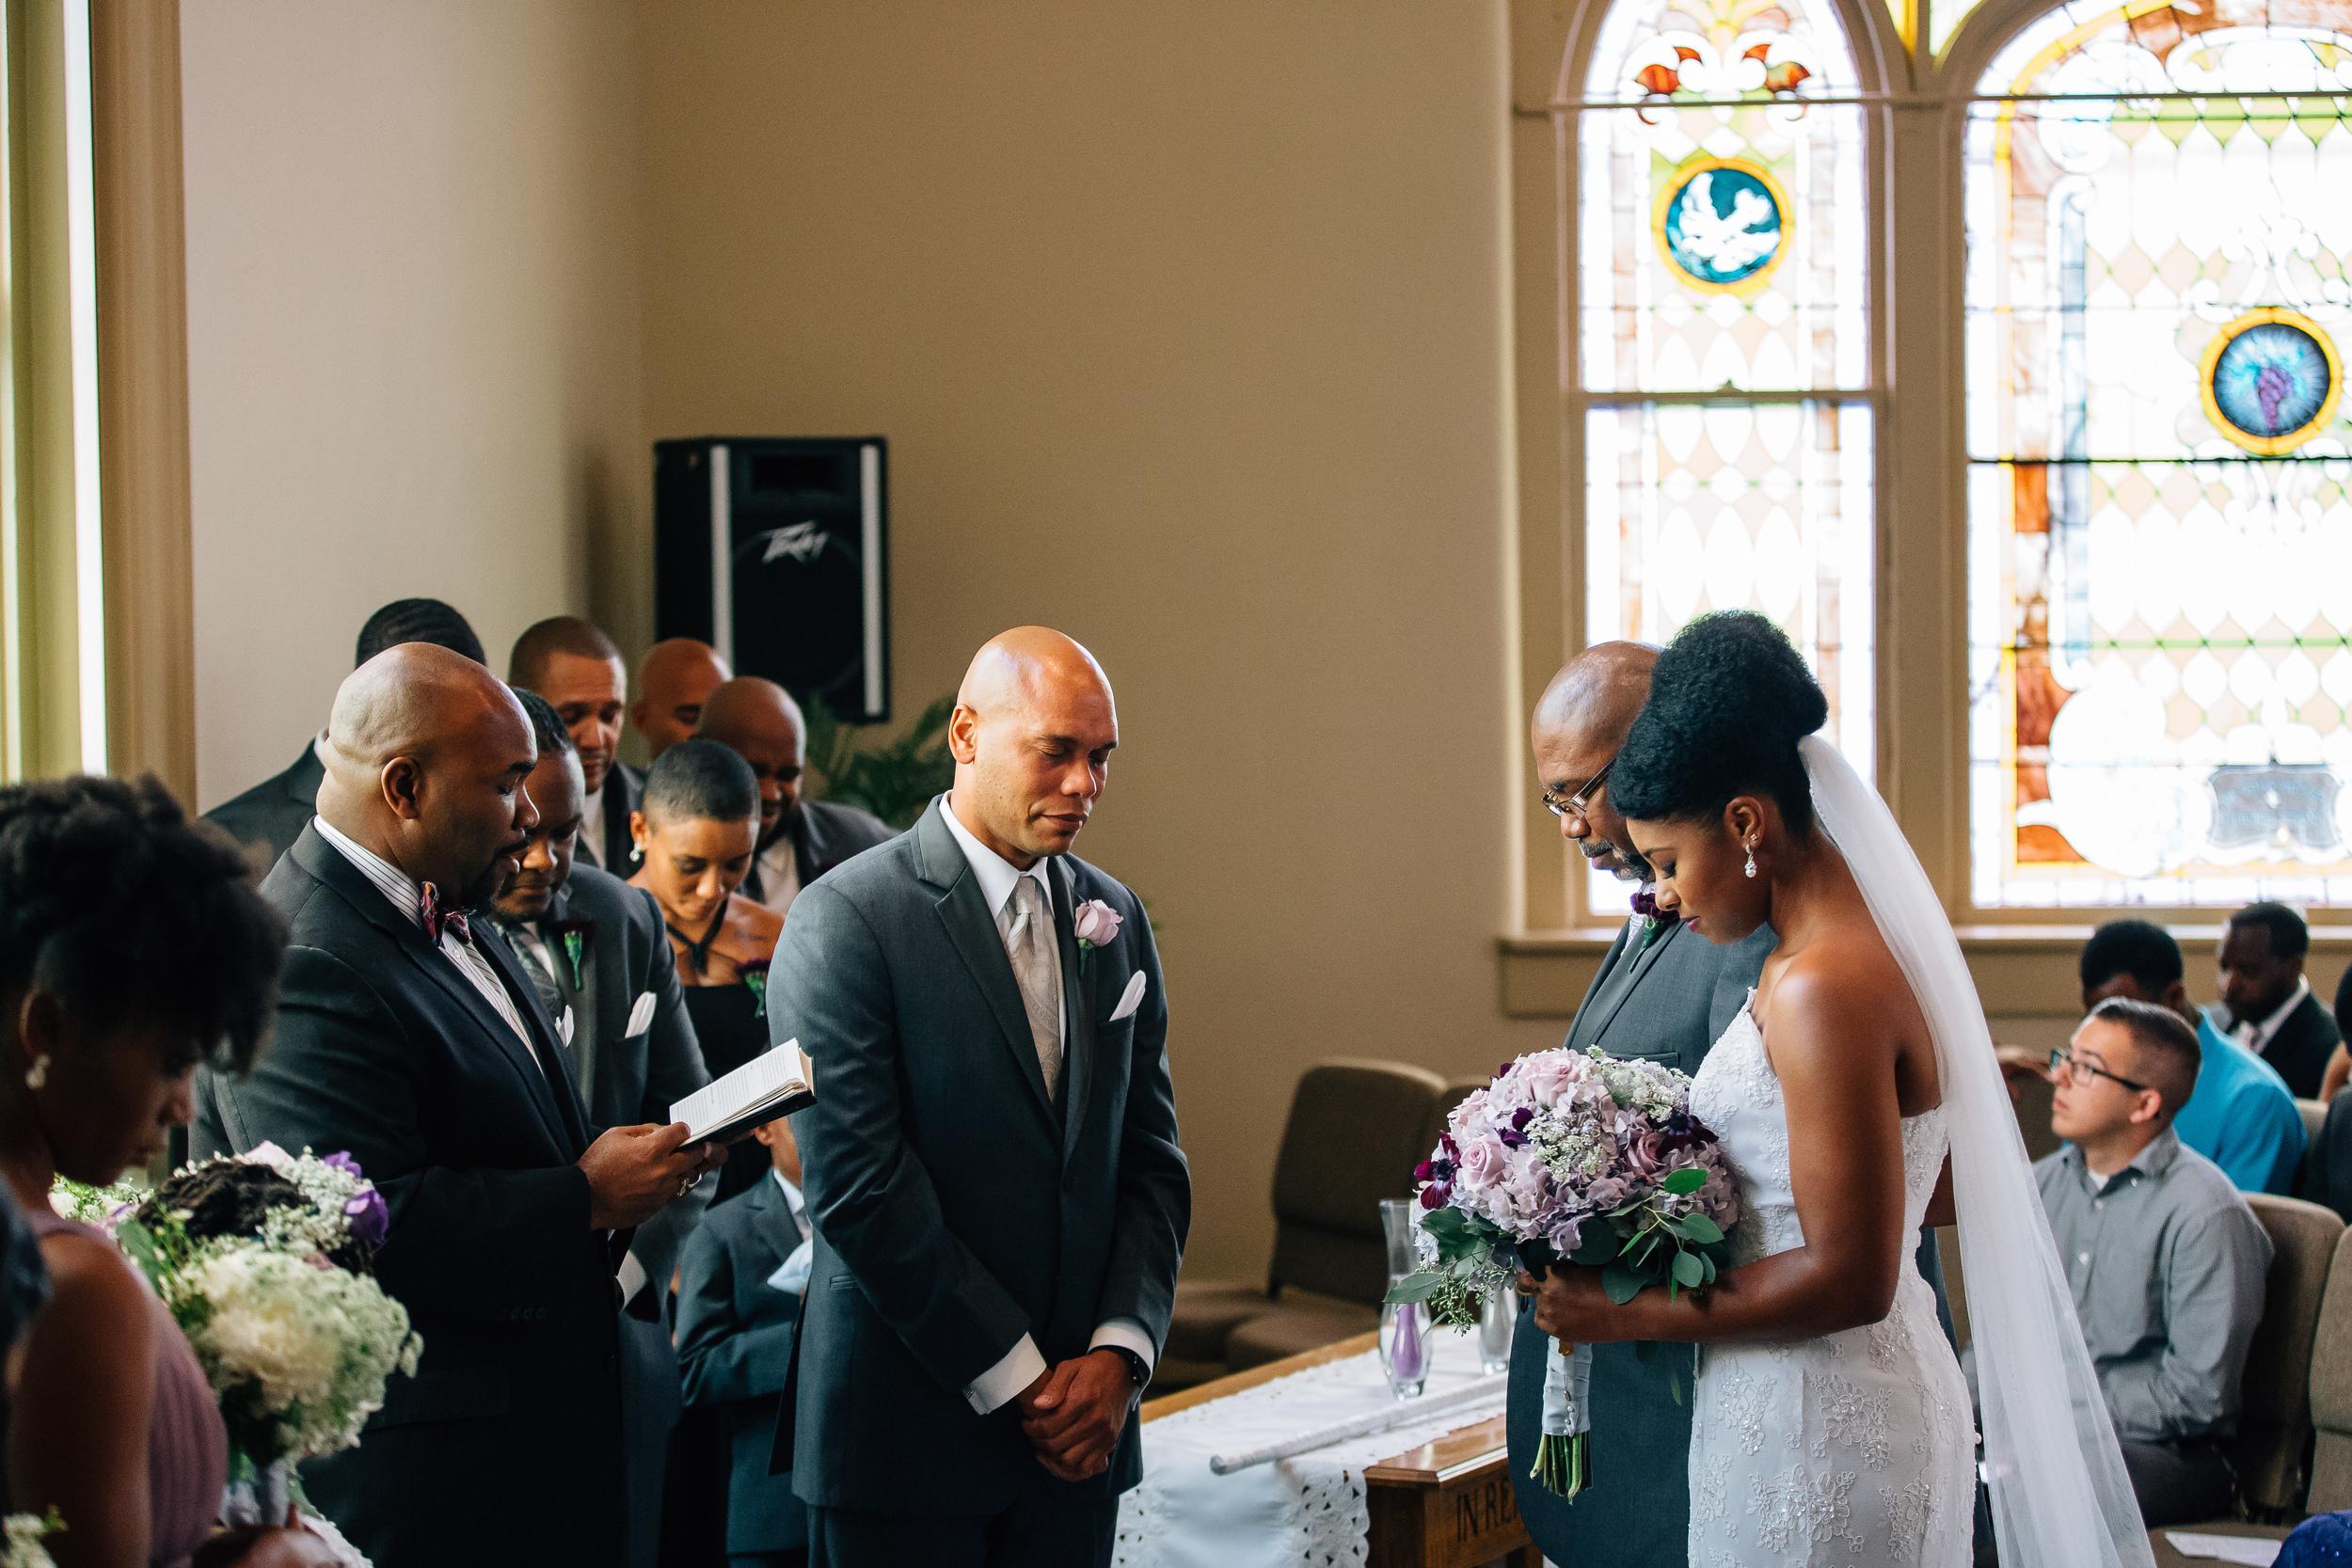 Chuck & Alicia's Wedding - Corrie Mick Photography-238.jpg